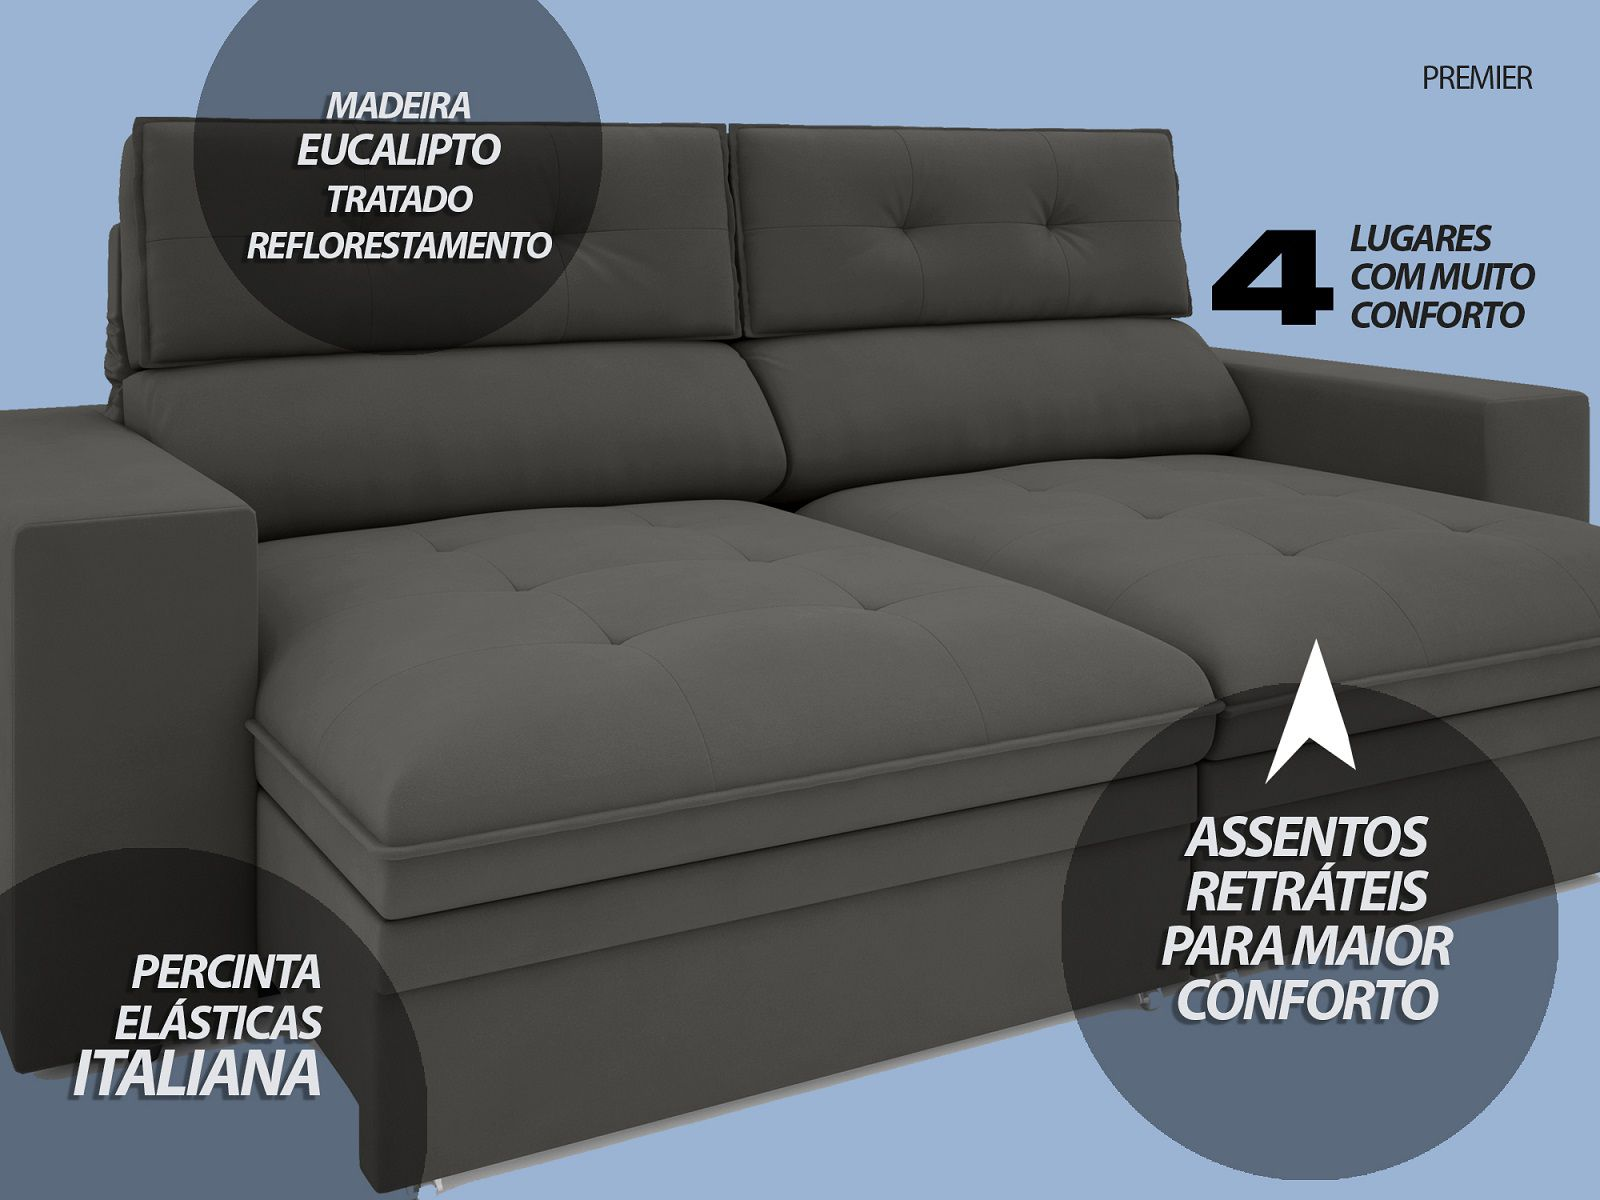 Sofá Premier 2,23m Retrátil e Reclinável Com Baú Velosuede Cinza - NETSOFAS